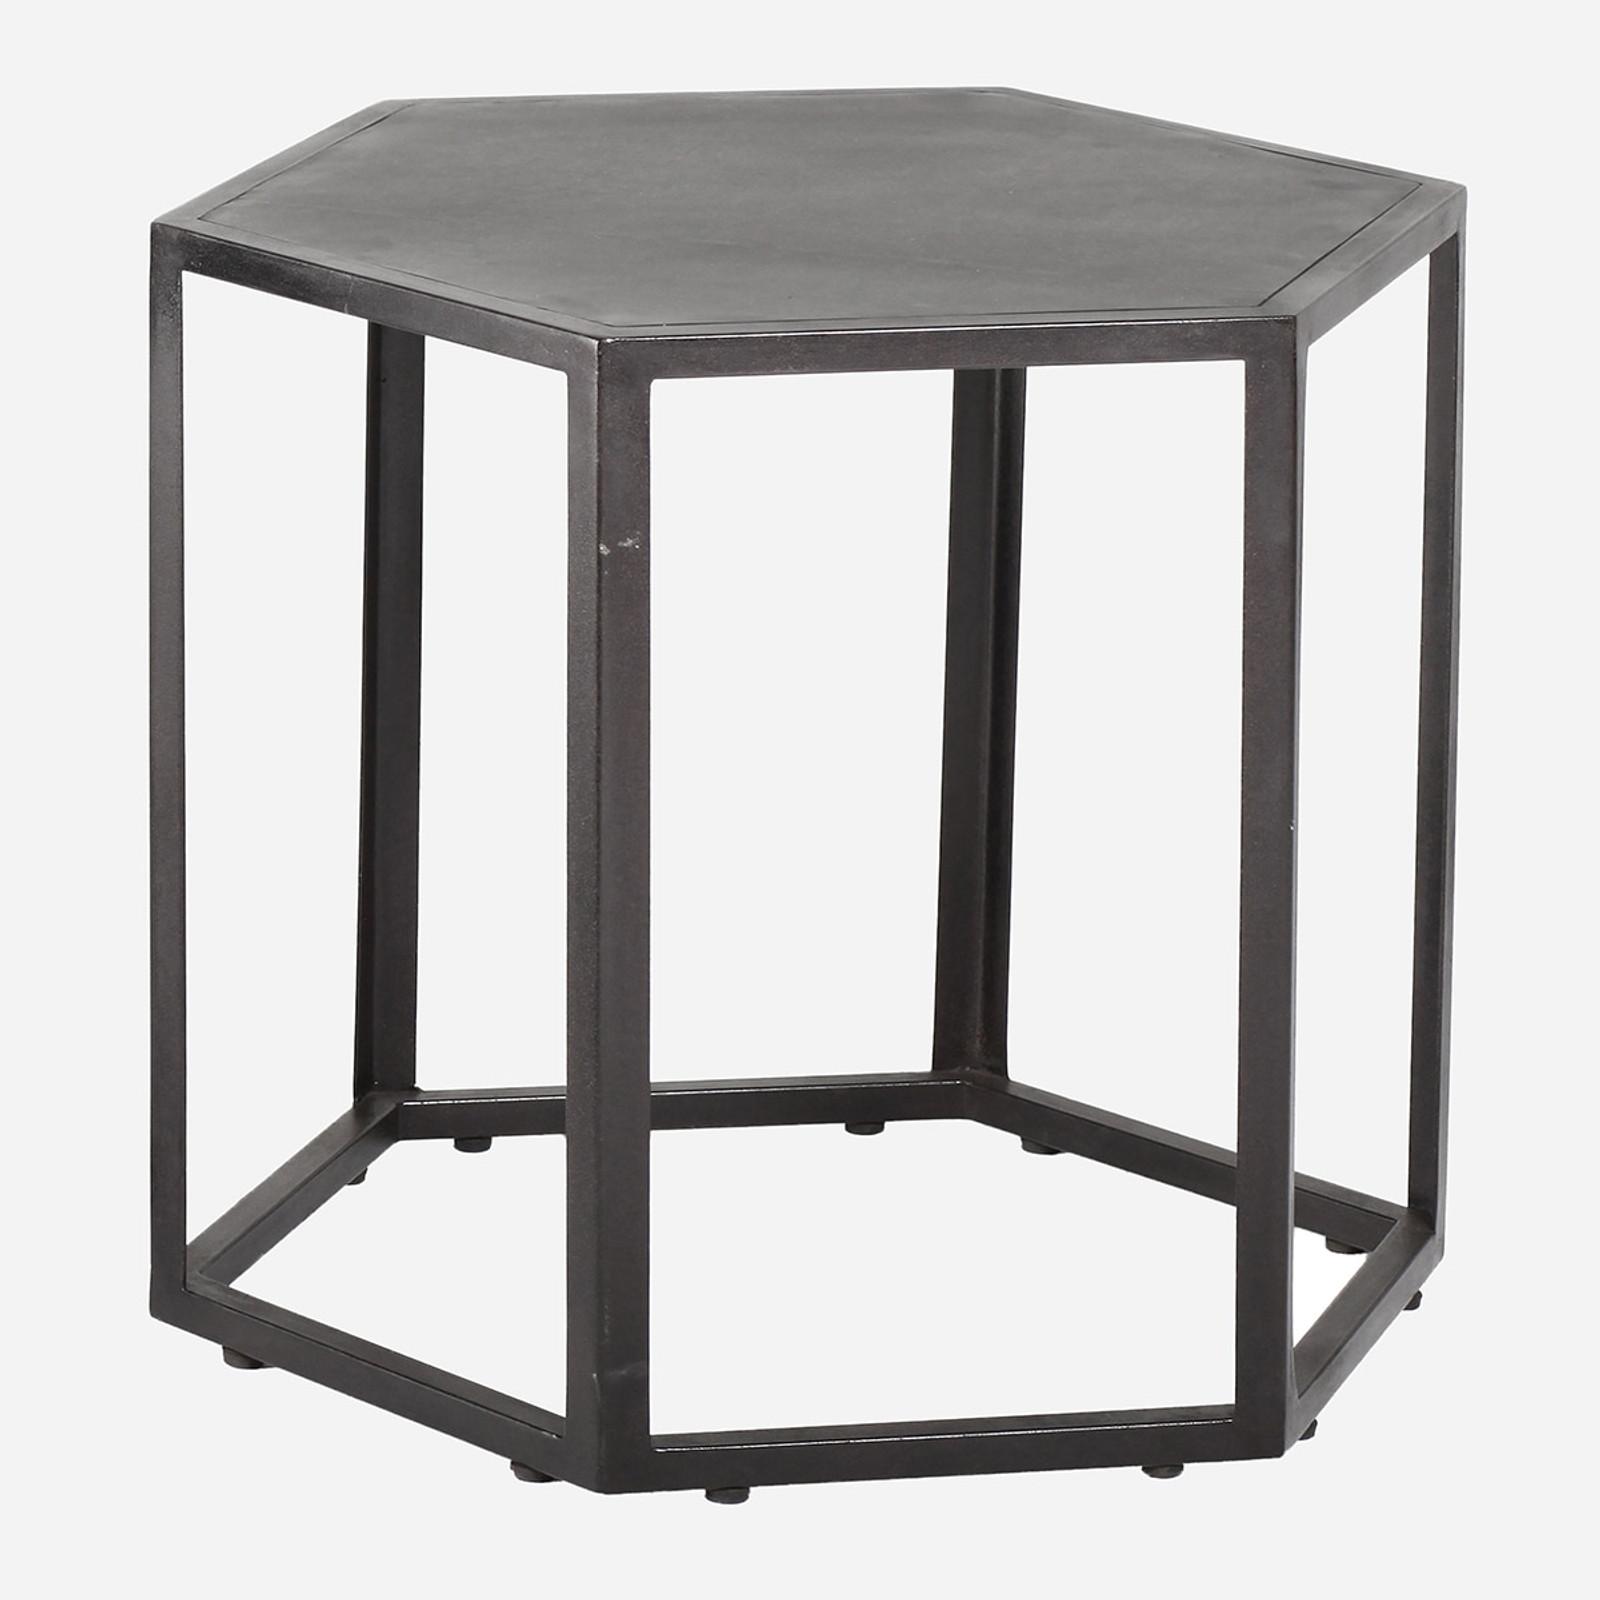 Hexagonal Rubber Side Table, Sm